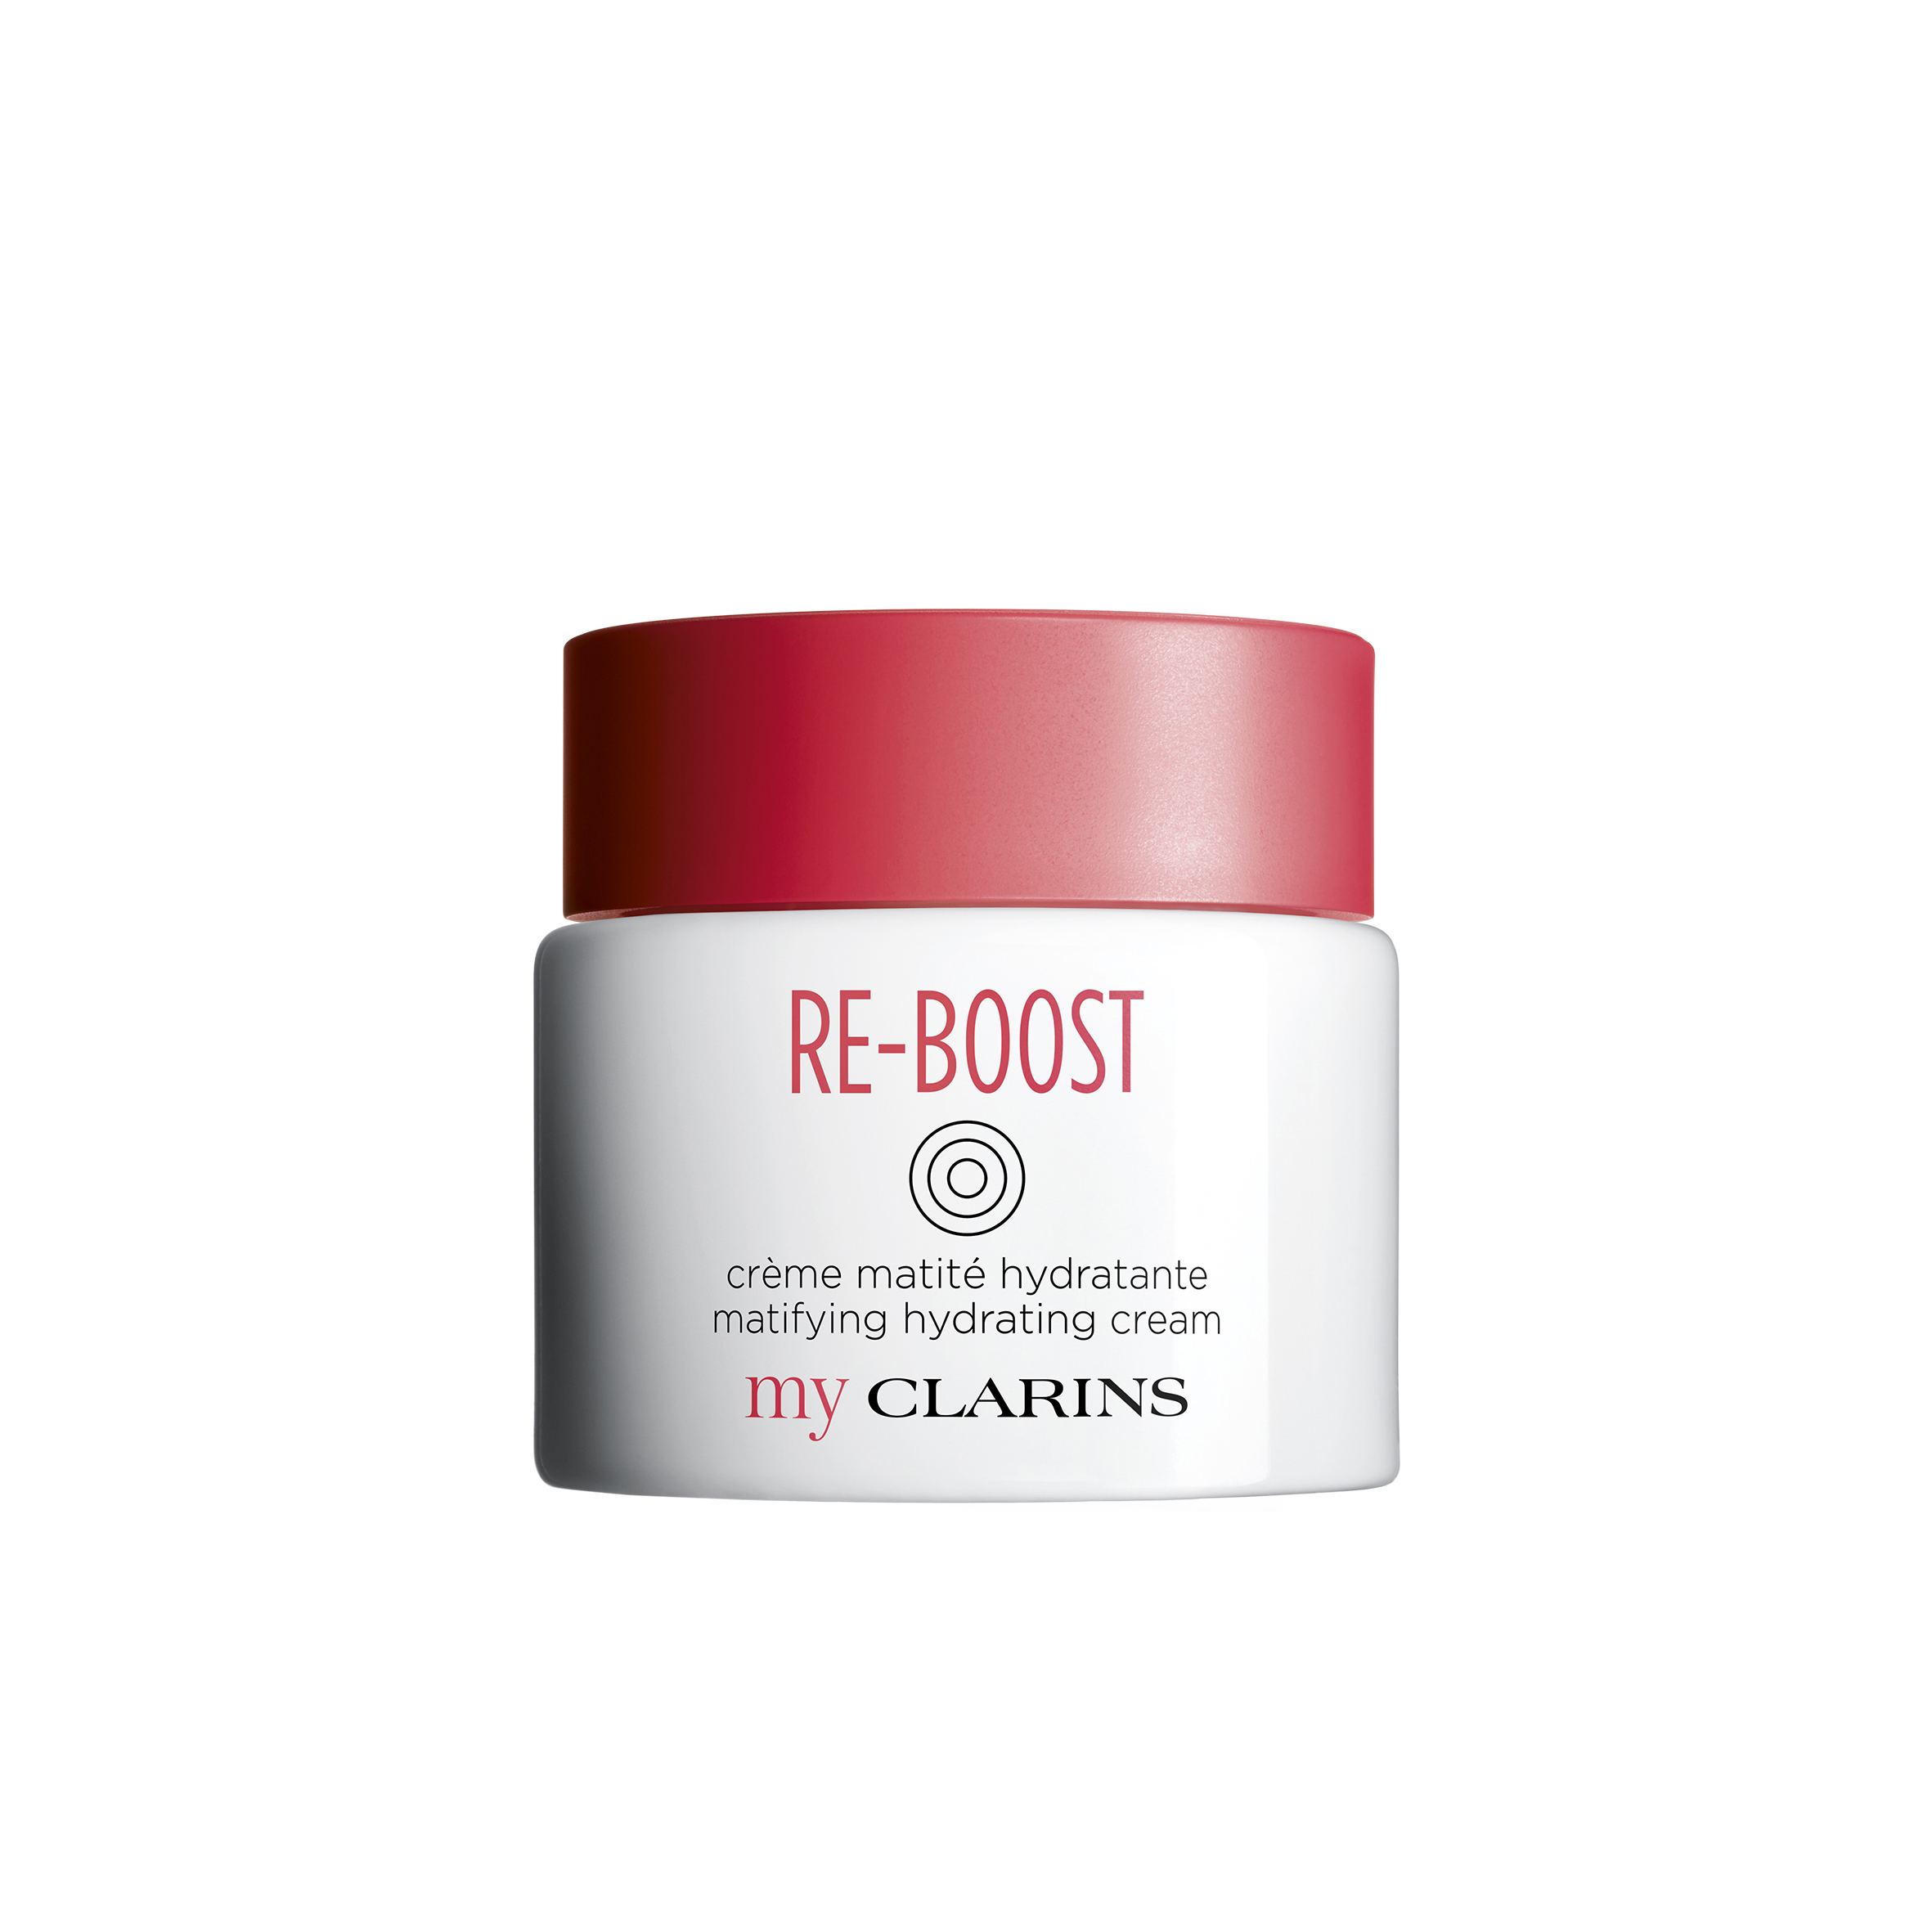 MyRe-Boost Matifying Hydrating Cream 50ml